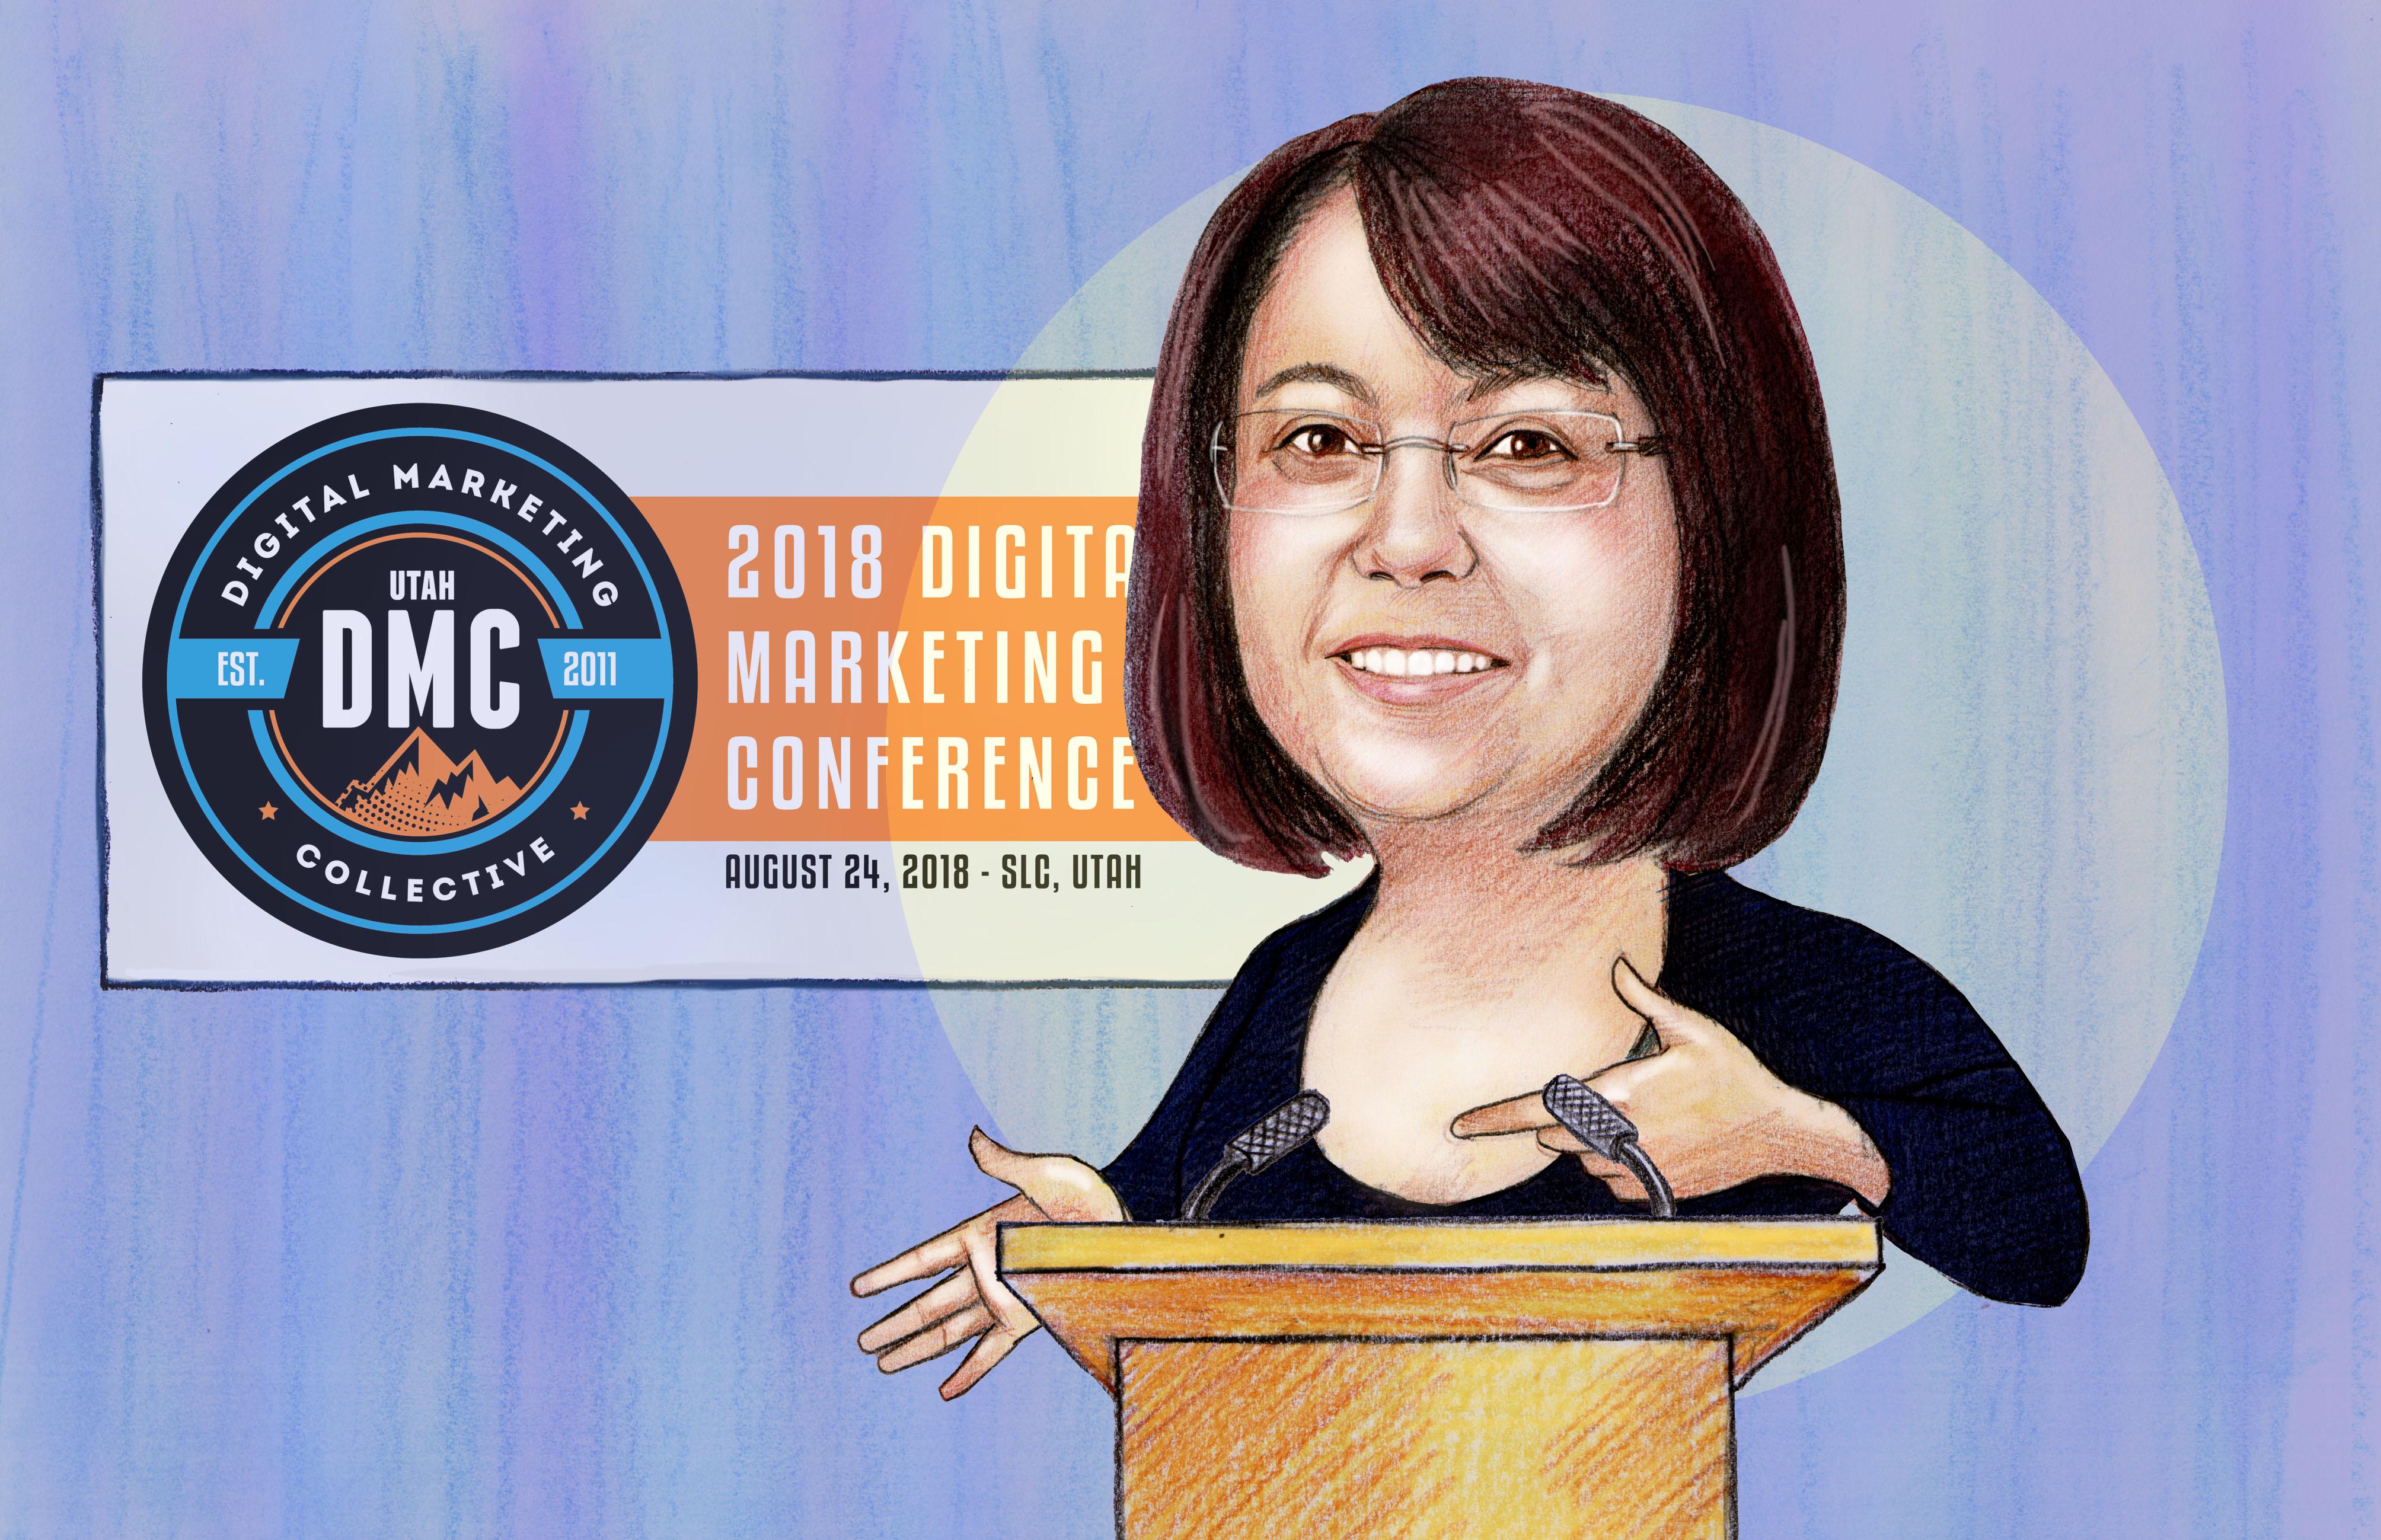 PPC Optimization Through Marketing Automation with Heather Cooan [DMC Recap]